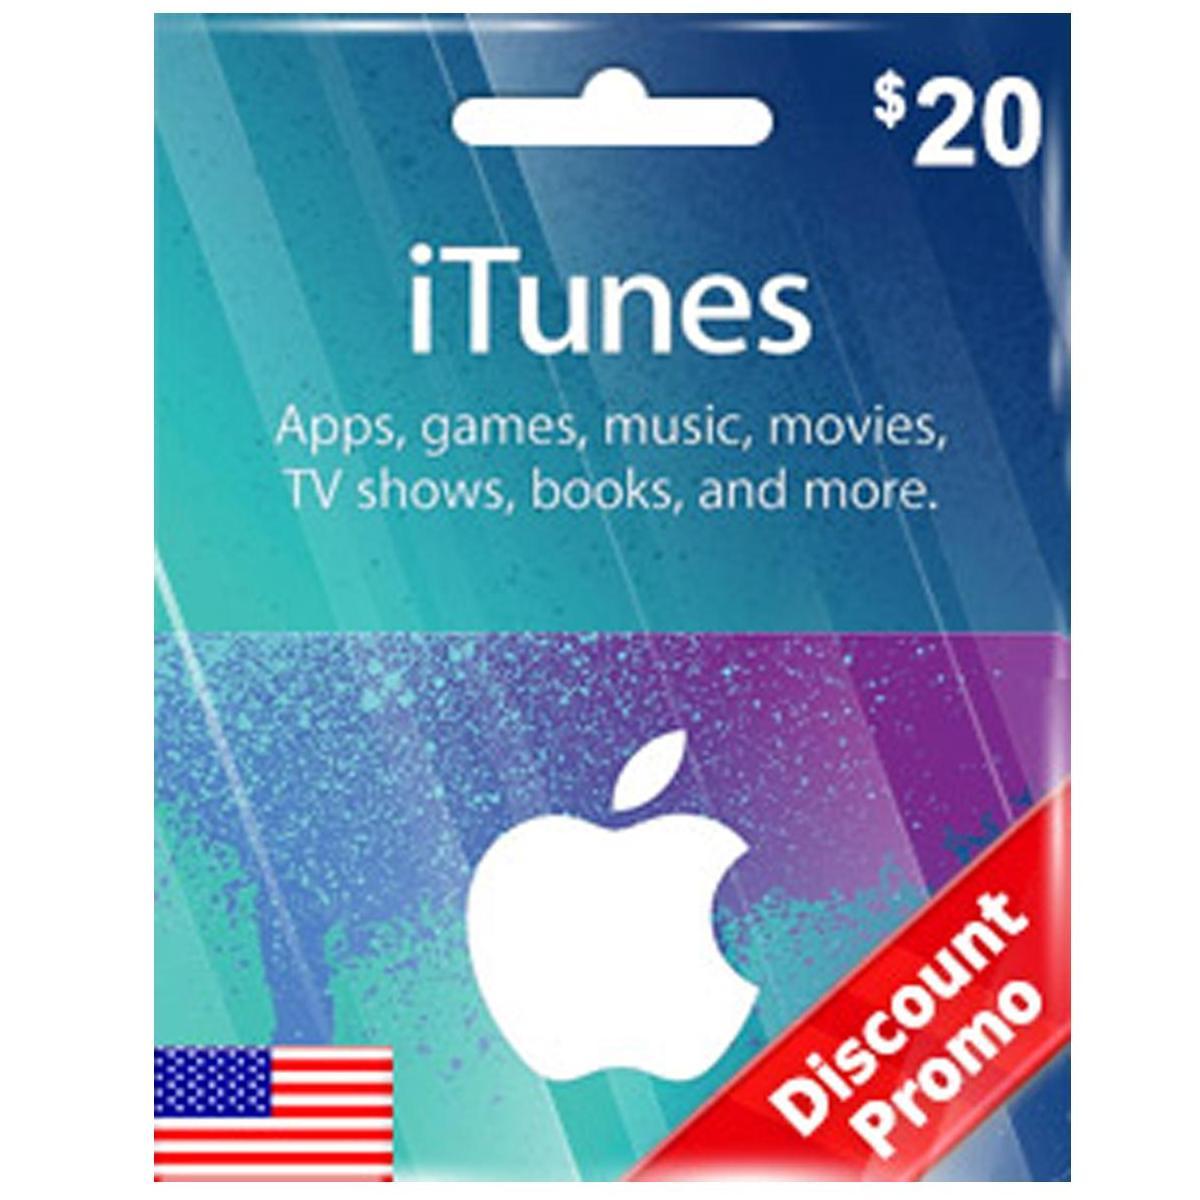 OPPO,Apple Philippines - OPPO,Apple Digital Game Wallets for